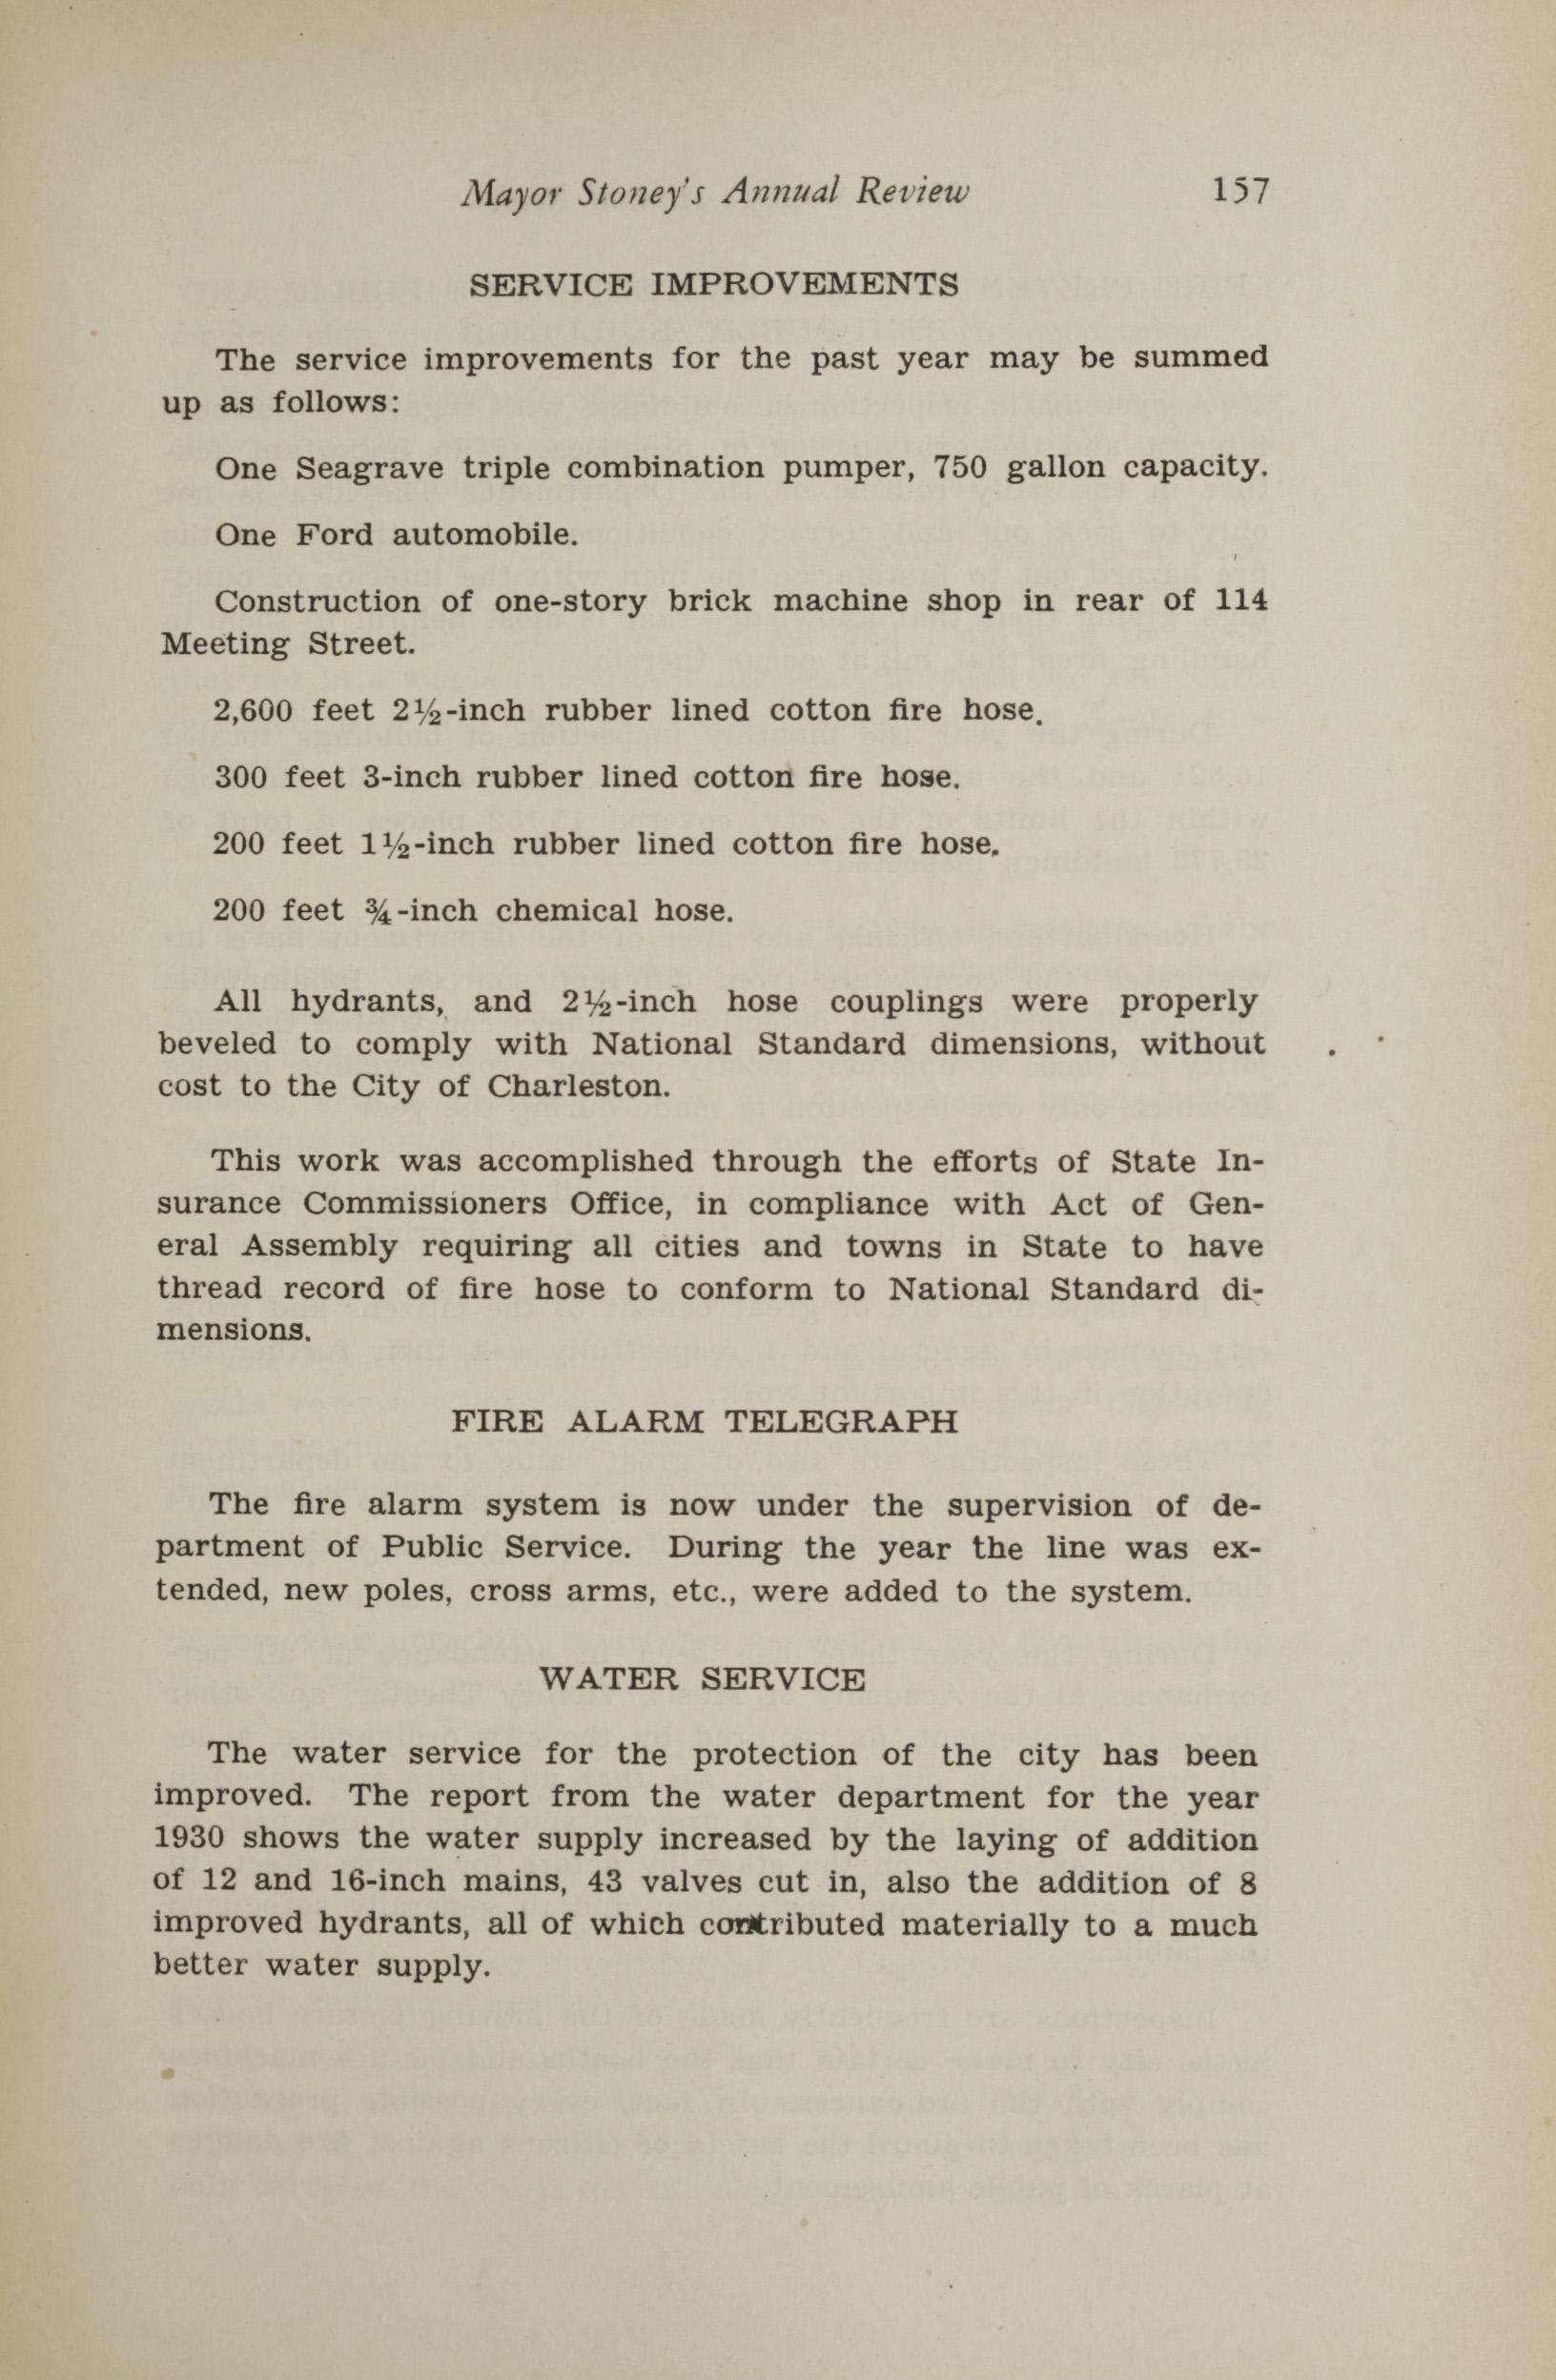 Charleston Yearbook, 1930, page 157